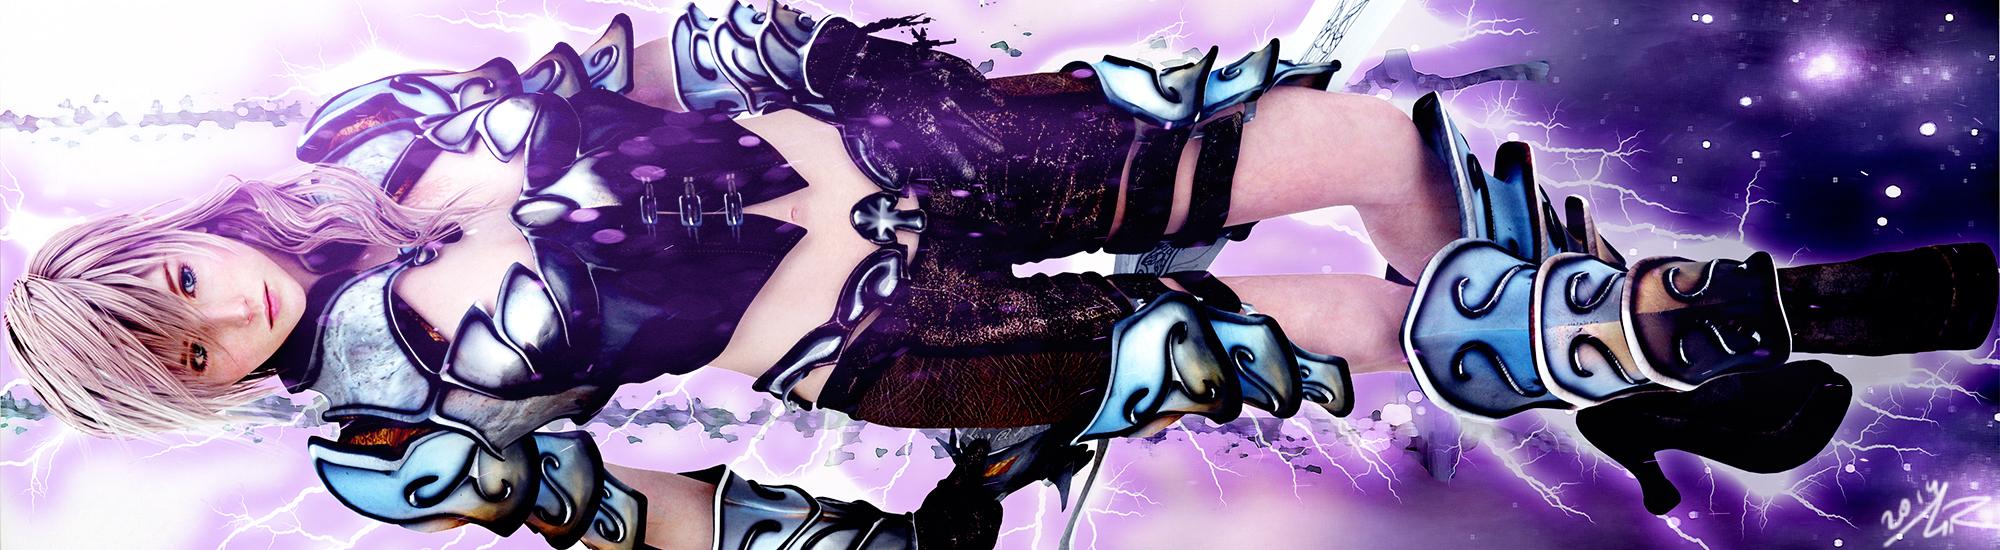 Purple Bolt by sHoNi89